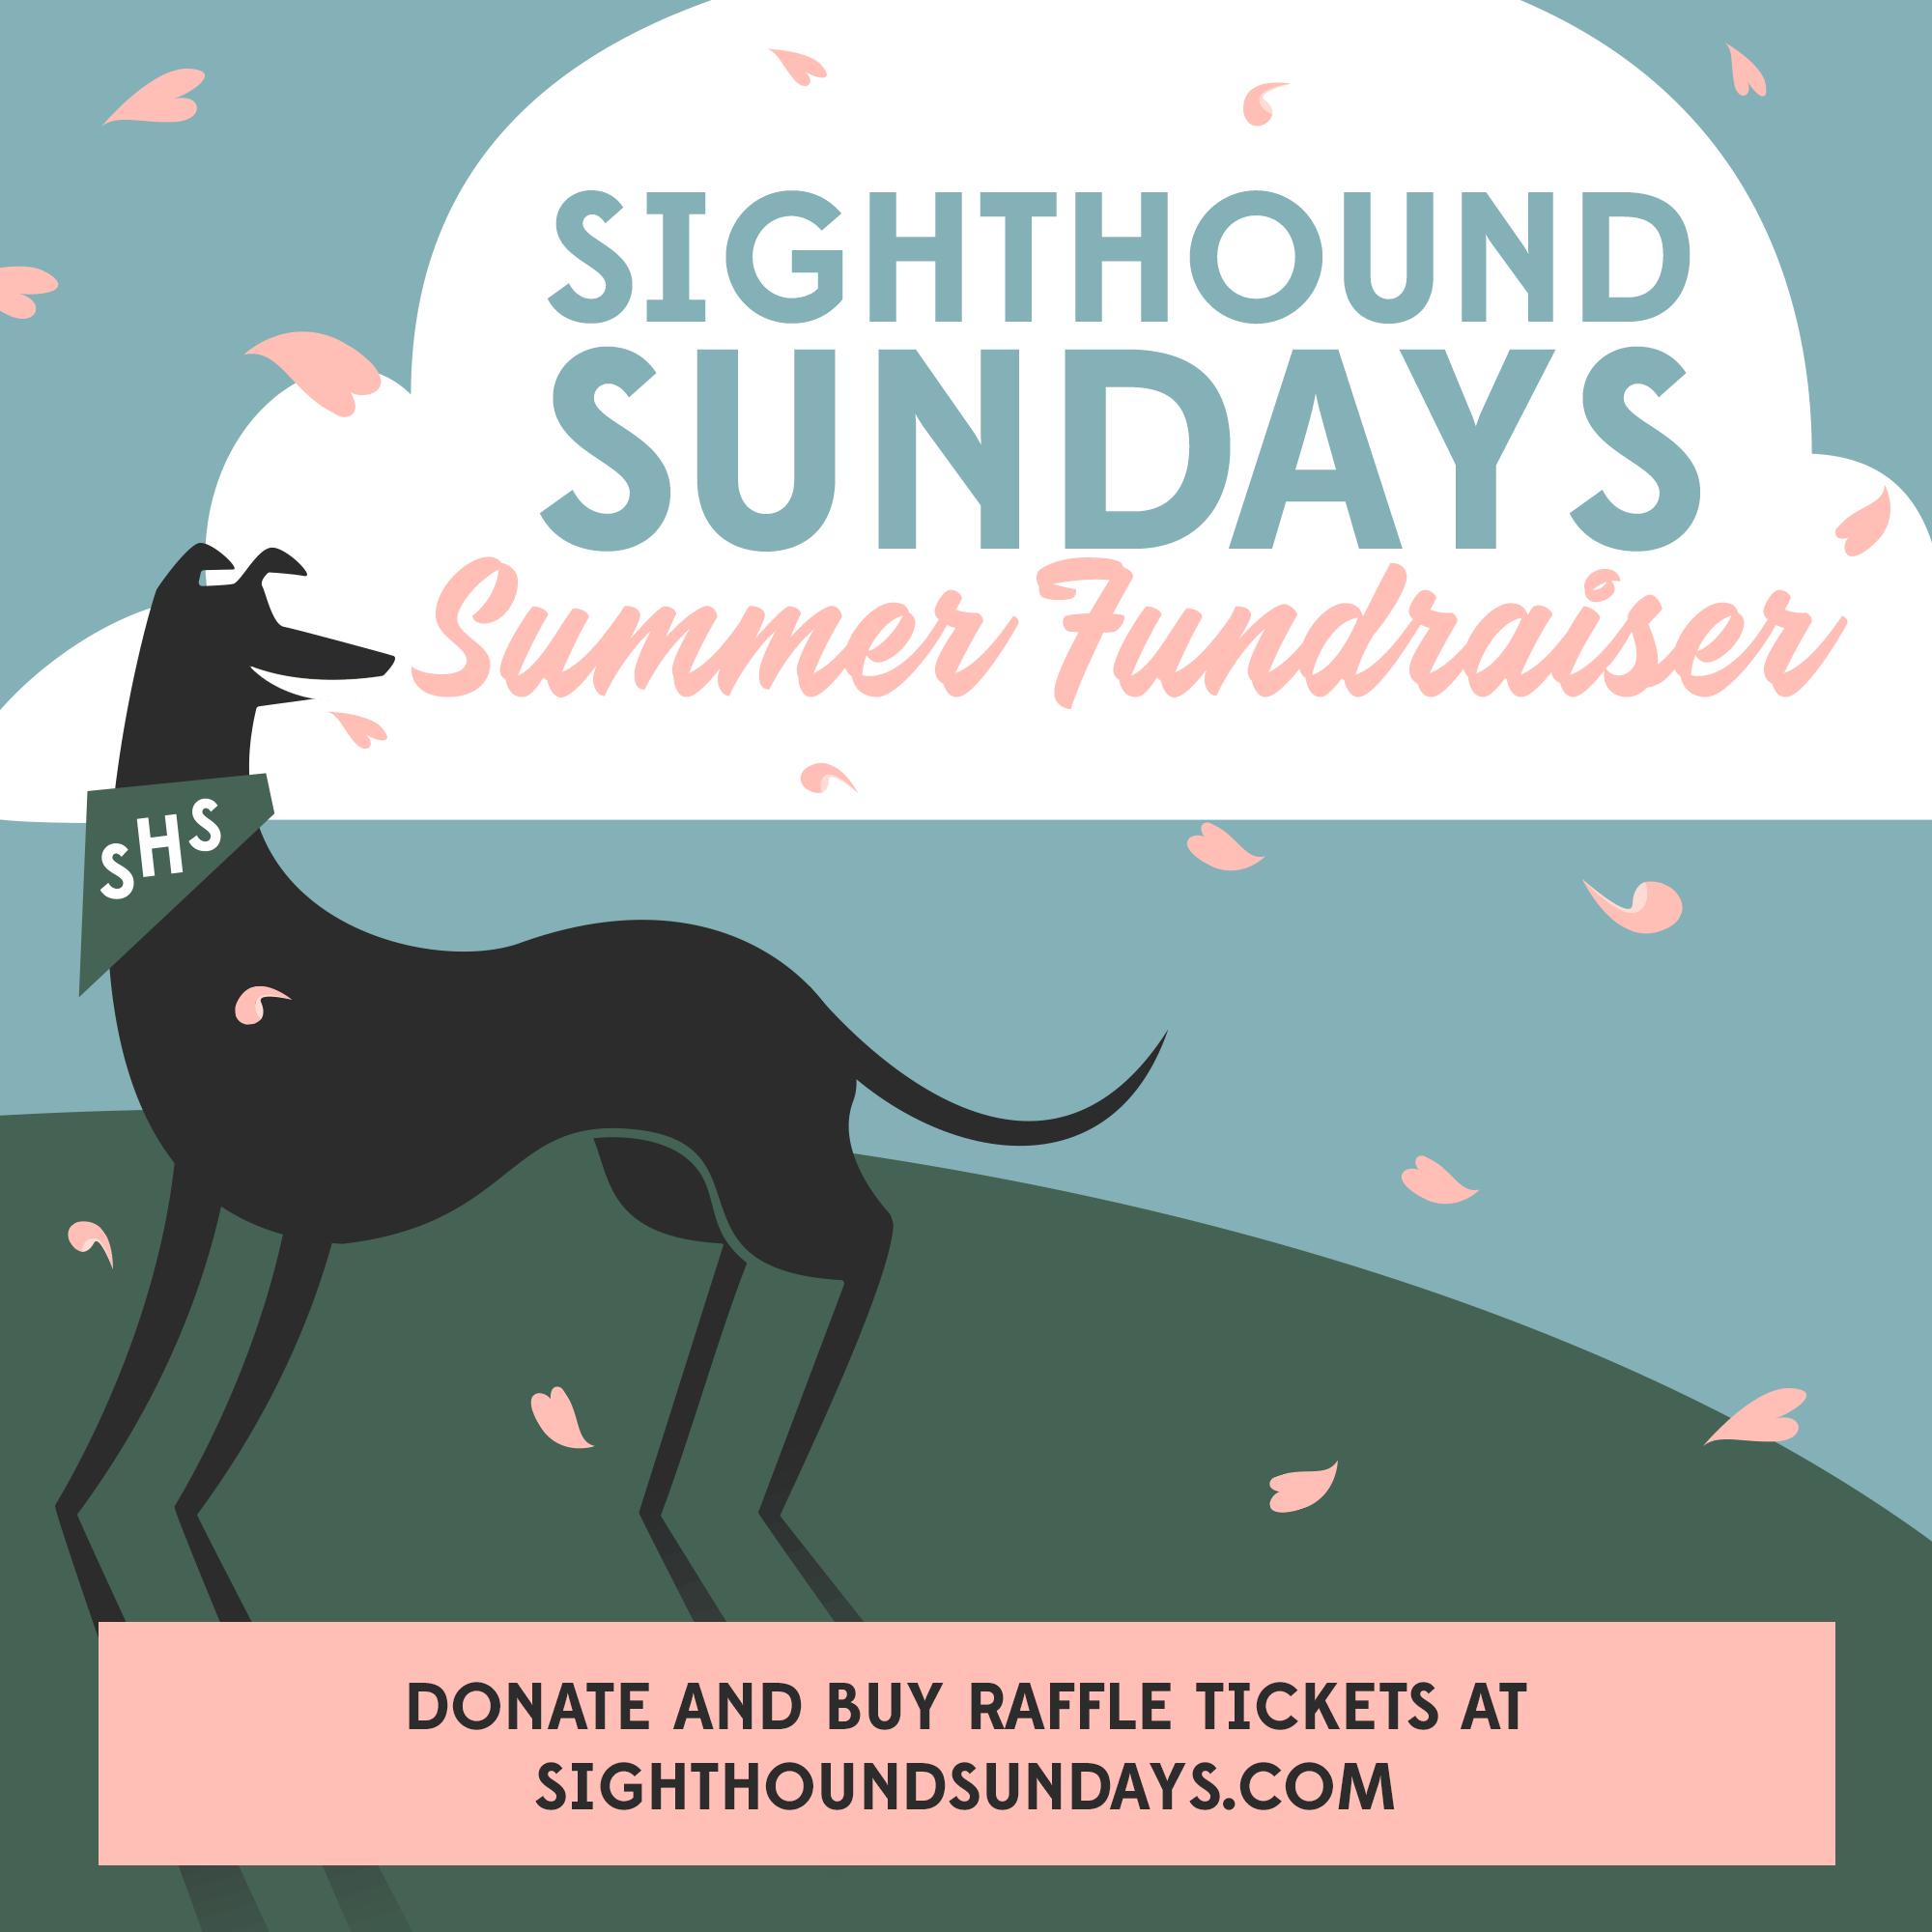 SighthoundSundays_Instagram_SpringFundraiser.png